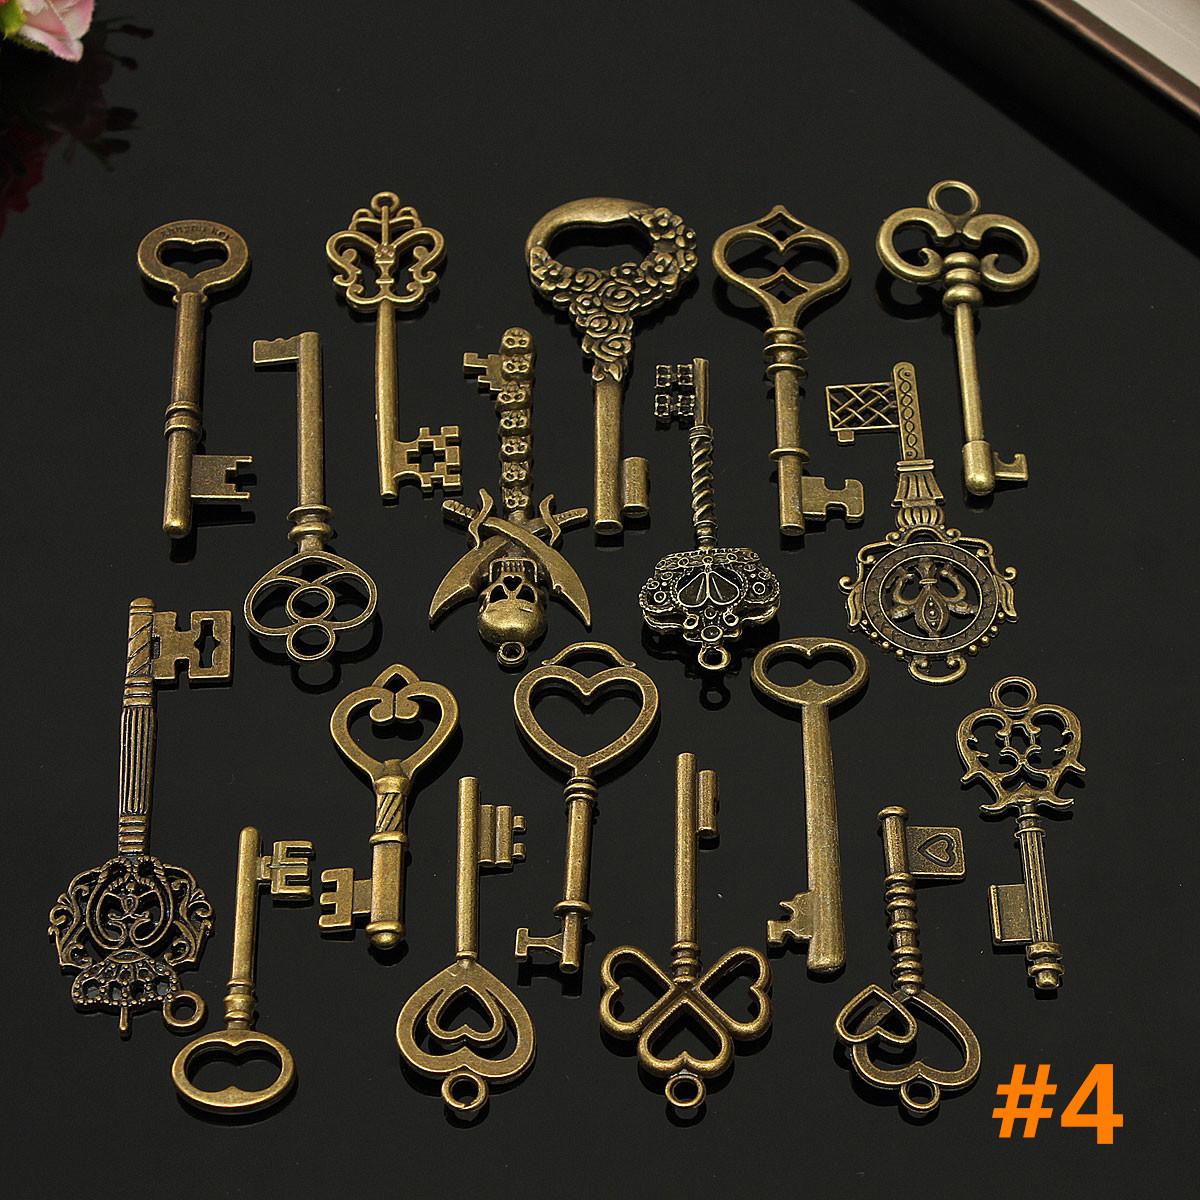 vintage style key set - photo #16